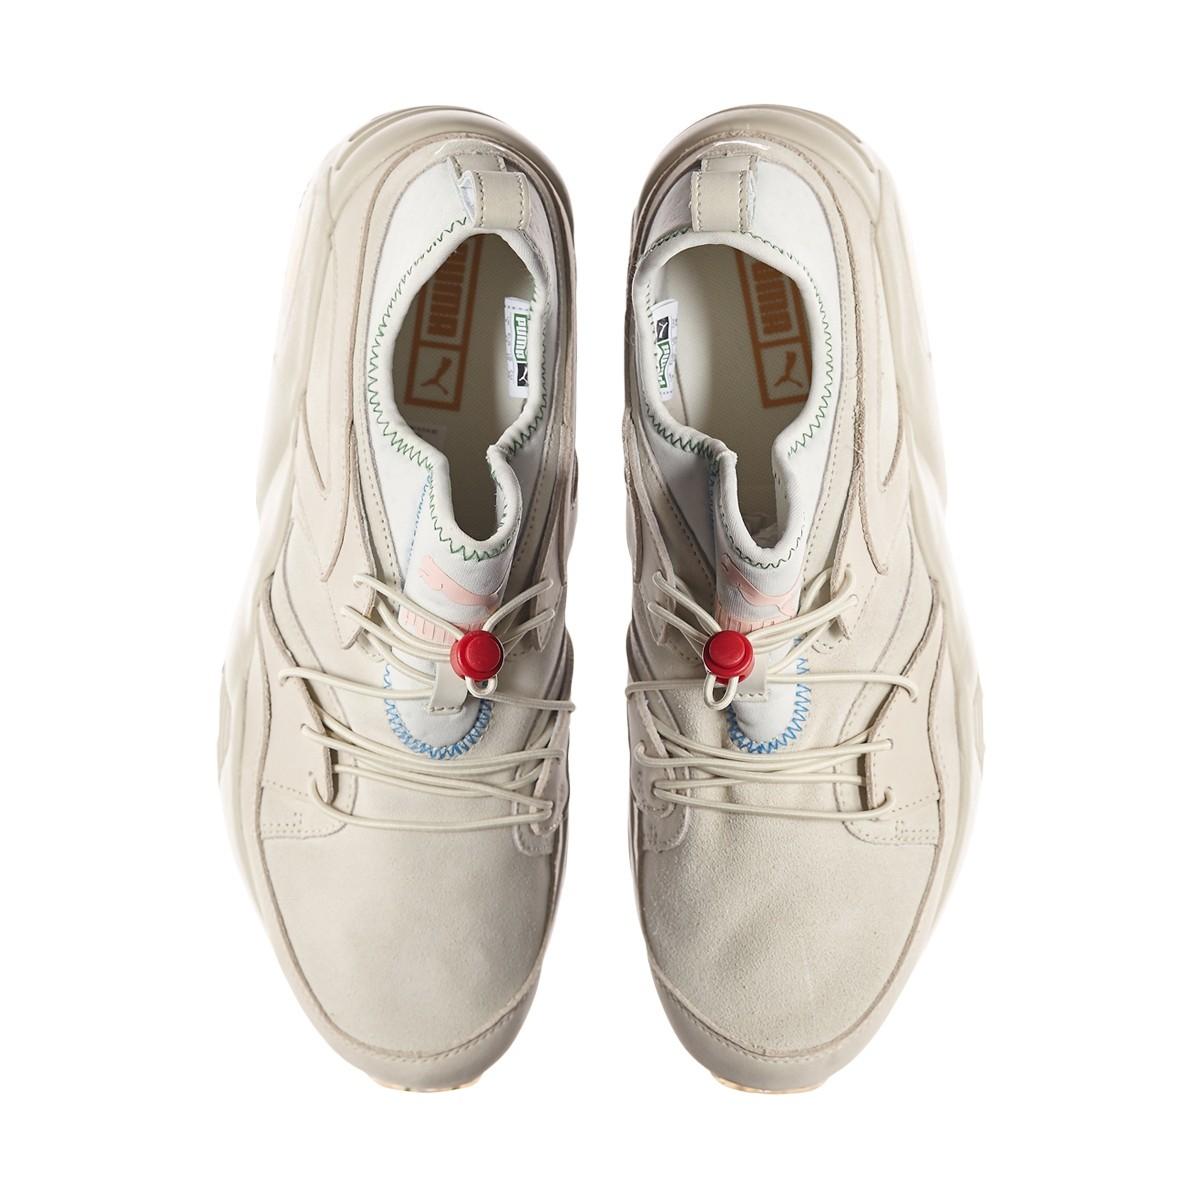 vente chaude en ligne 8f187 ef34e Lyst - PUMA Blaze Of Glory 'soft Flag Pack' Sneakers in ...